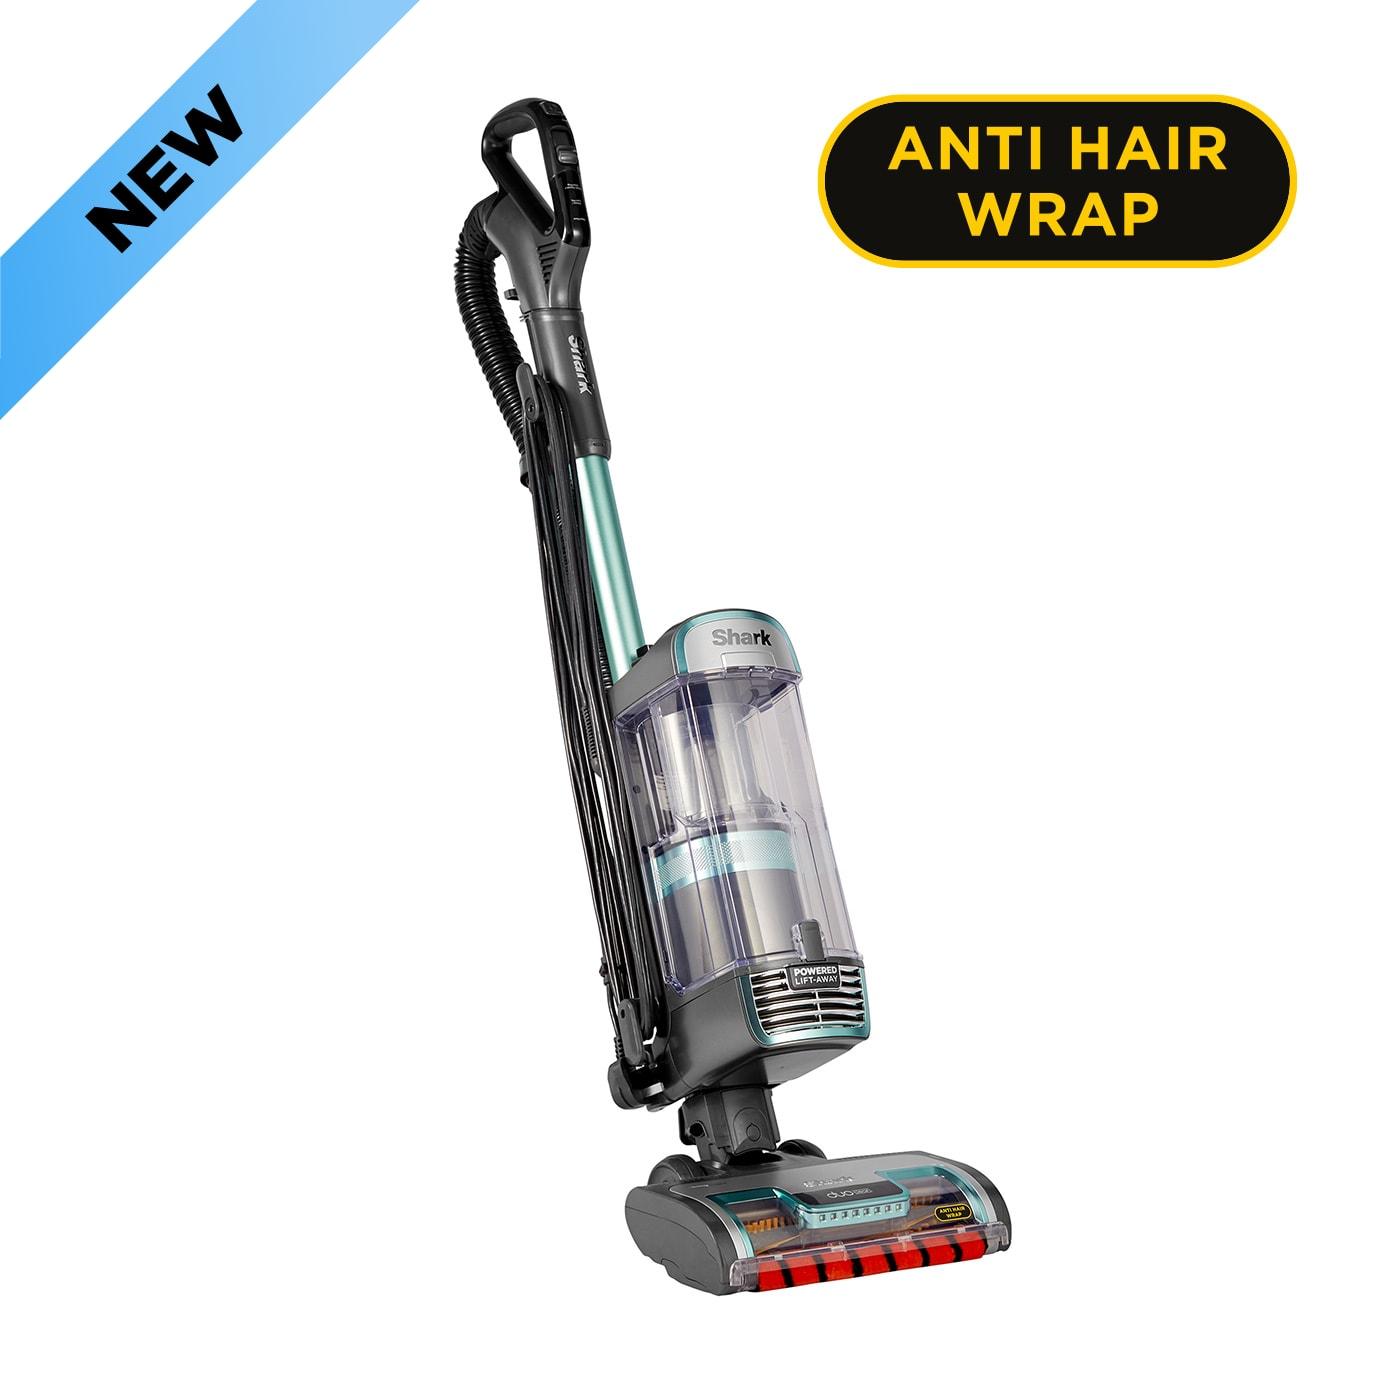 Shark Anti Hair Wrap Upright Vacuum Cleaner Plus with Powered Lift-Away & TruePet AZ912UKT product photo